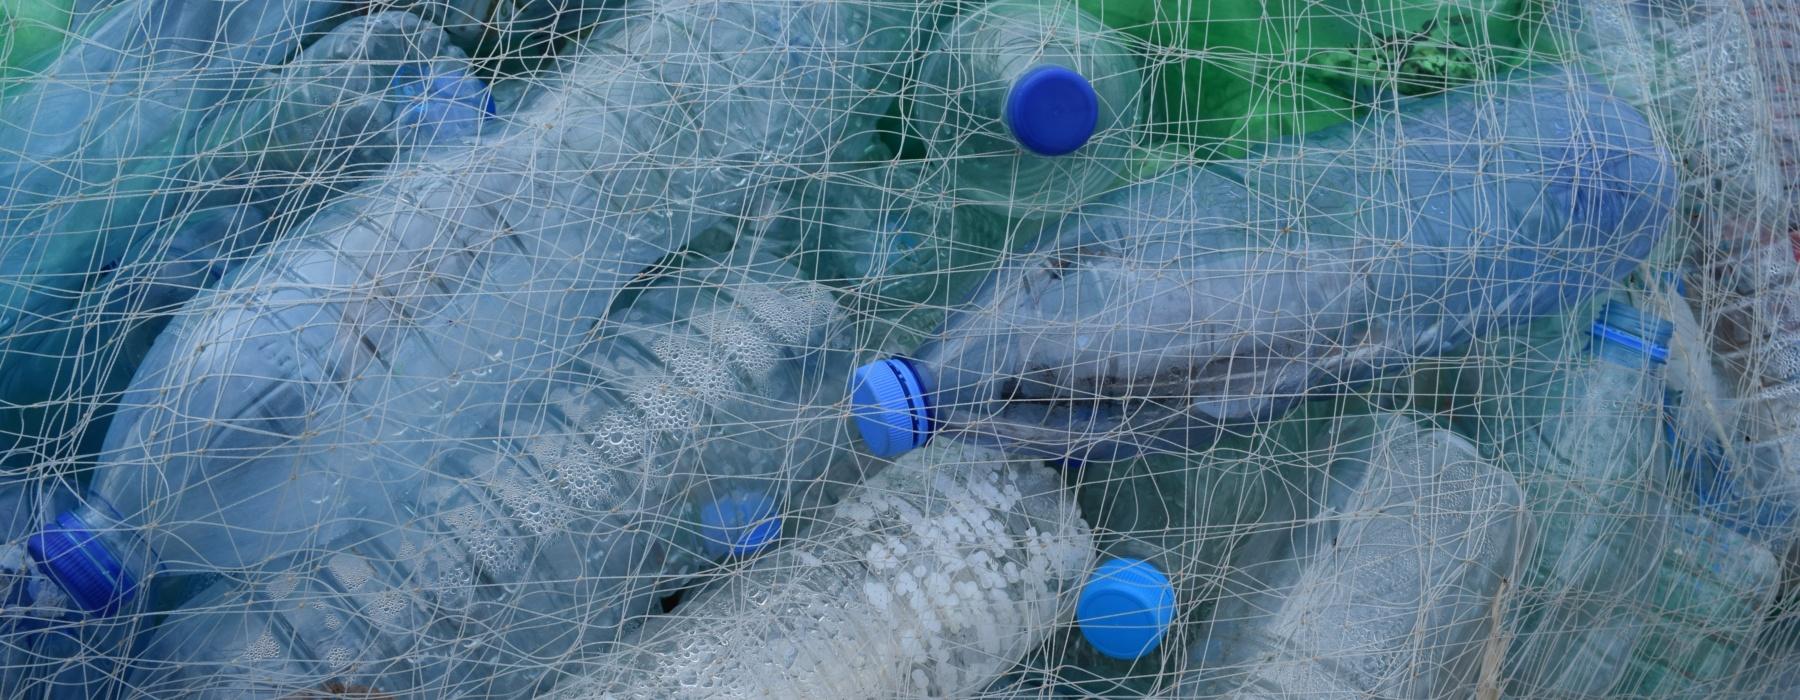 Plastic-free fortnight